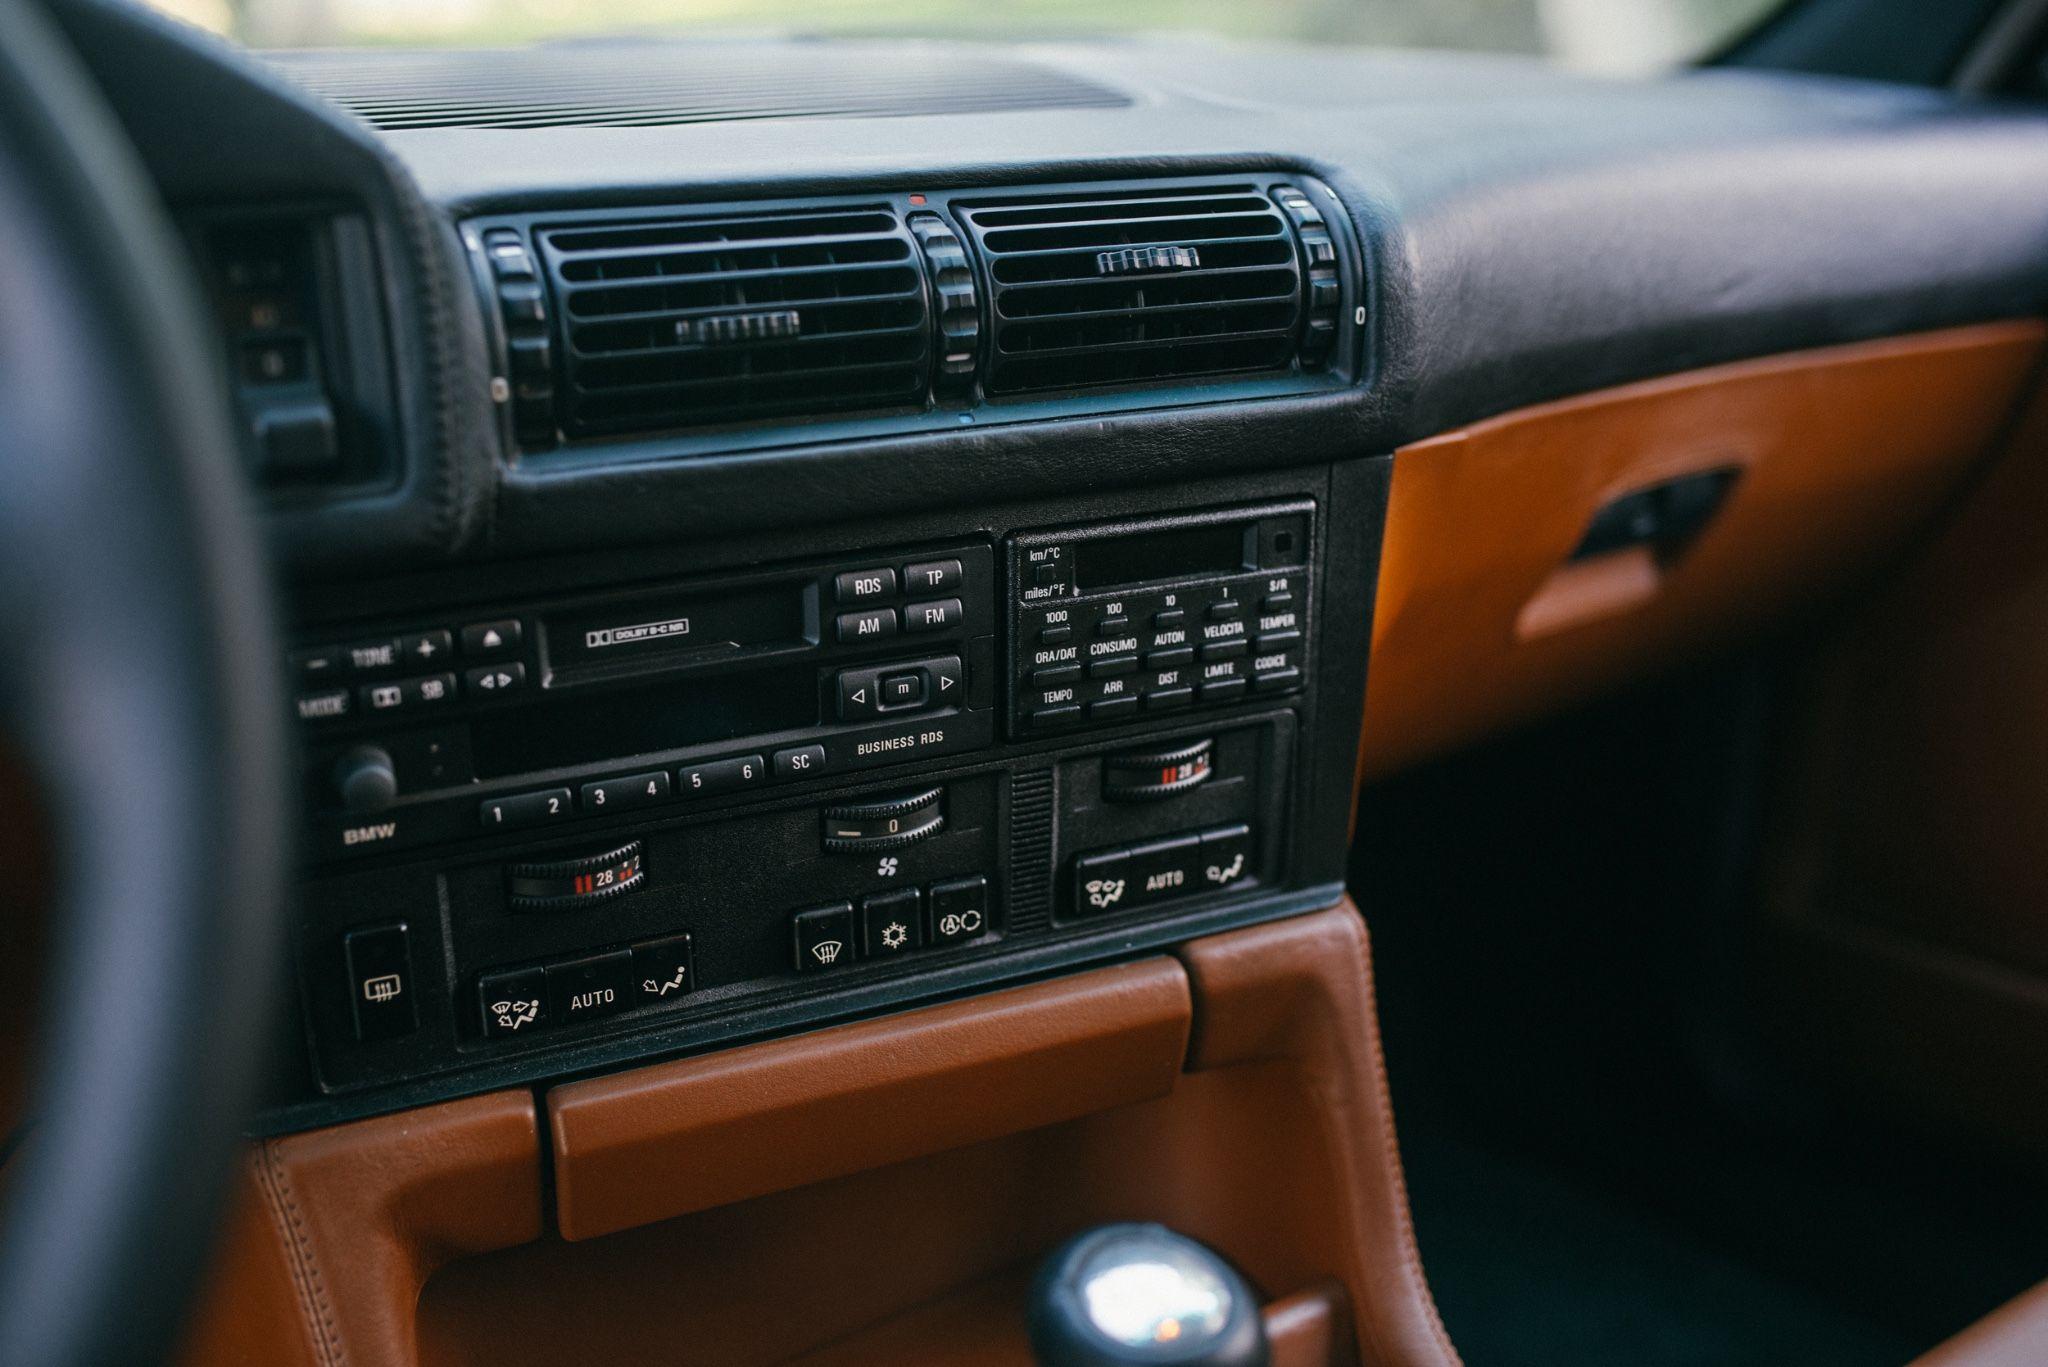 1995 Bmw M5 Touring Elekta Bmw M5 Touring Bmw Bmw M5